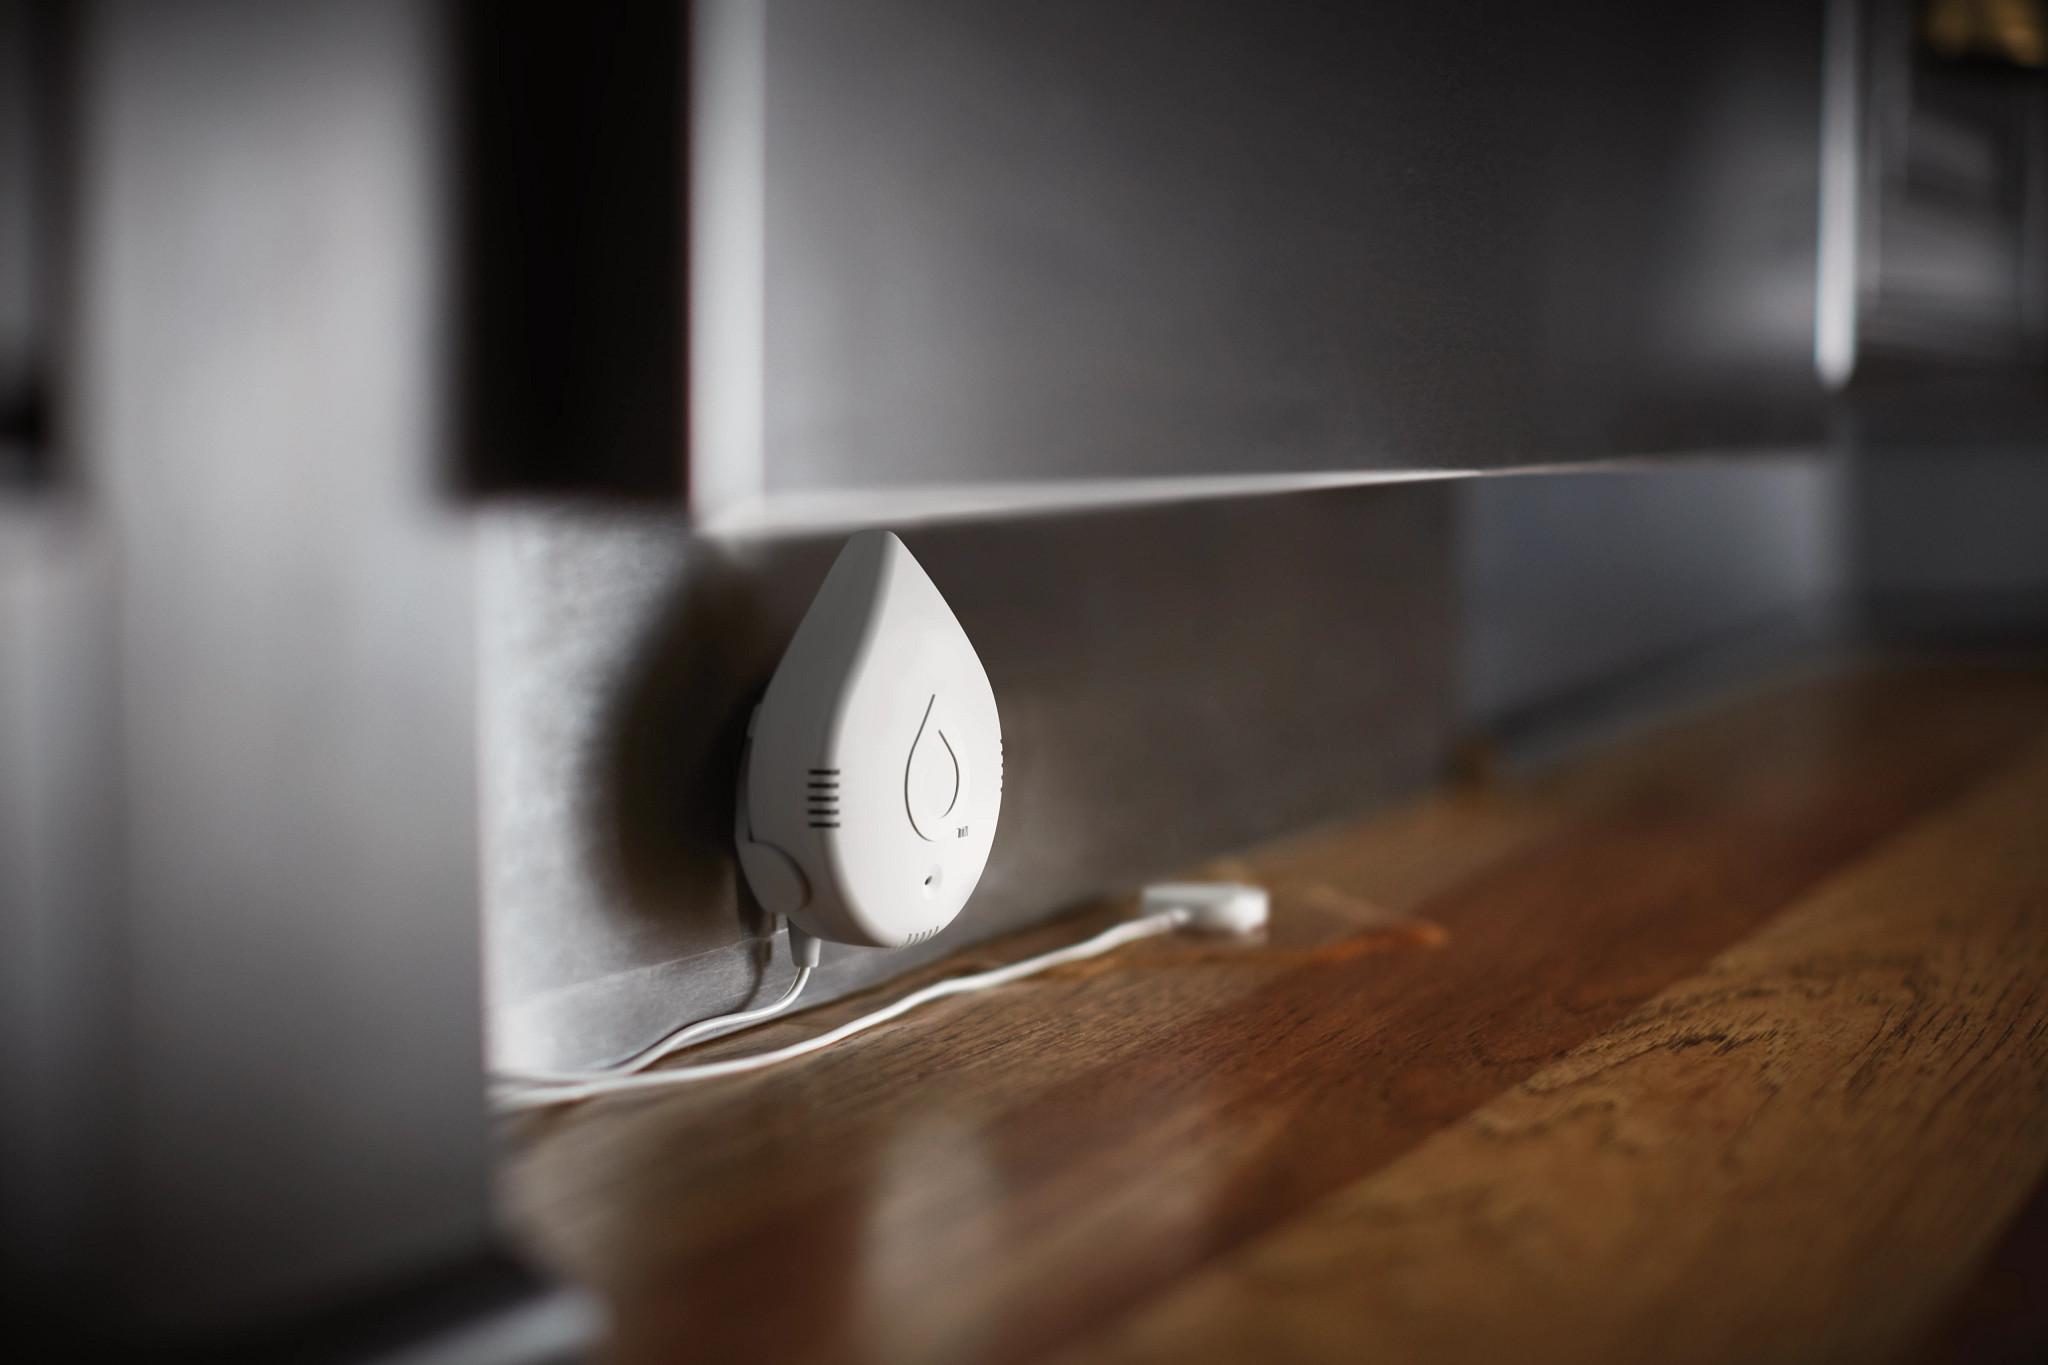 Flo by Moen Smart Water Detection